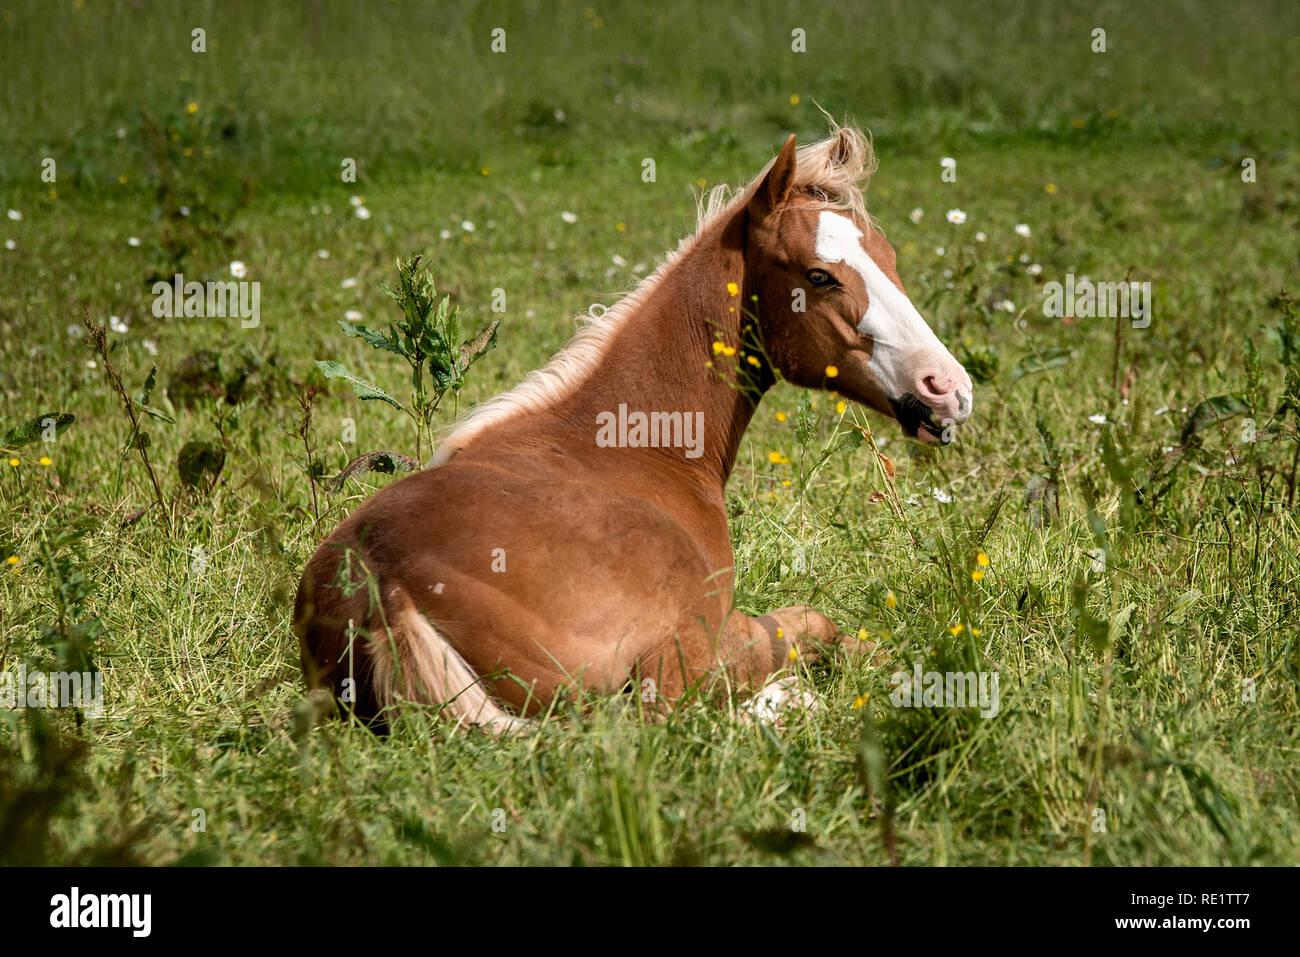 quarter horse foal RE1TT7